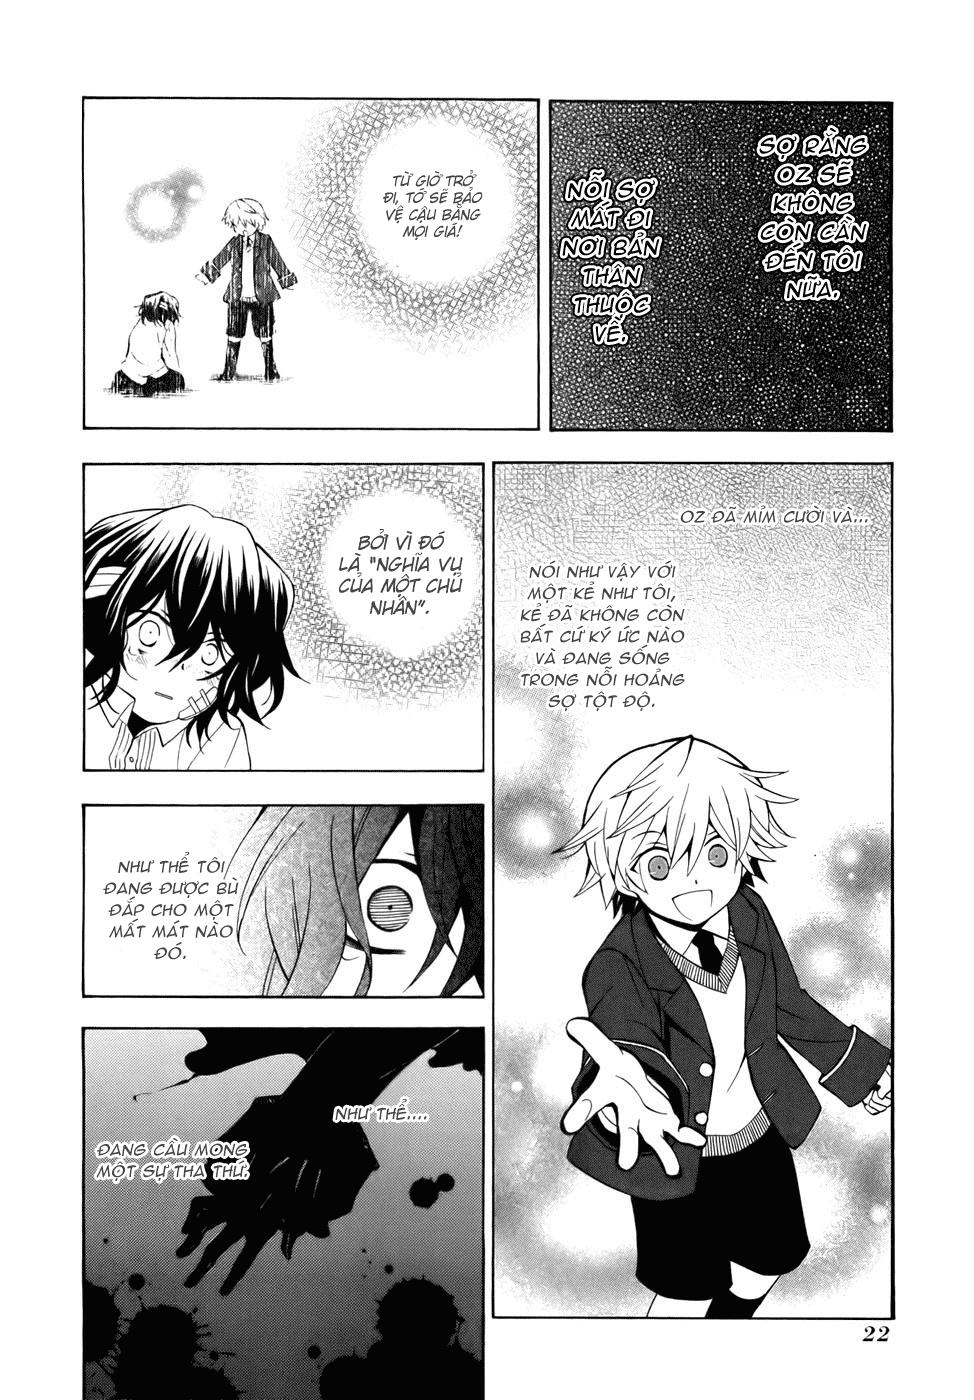 Pandora Hearts chương 038 - retrace - xxxviii scapegoat trang 21